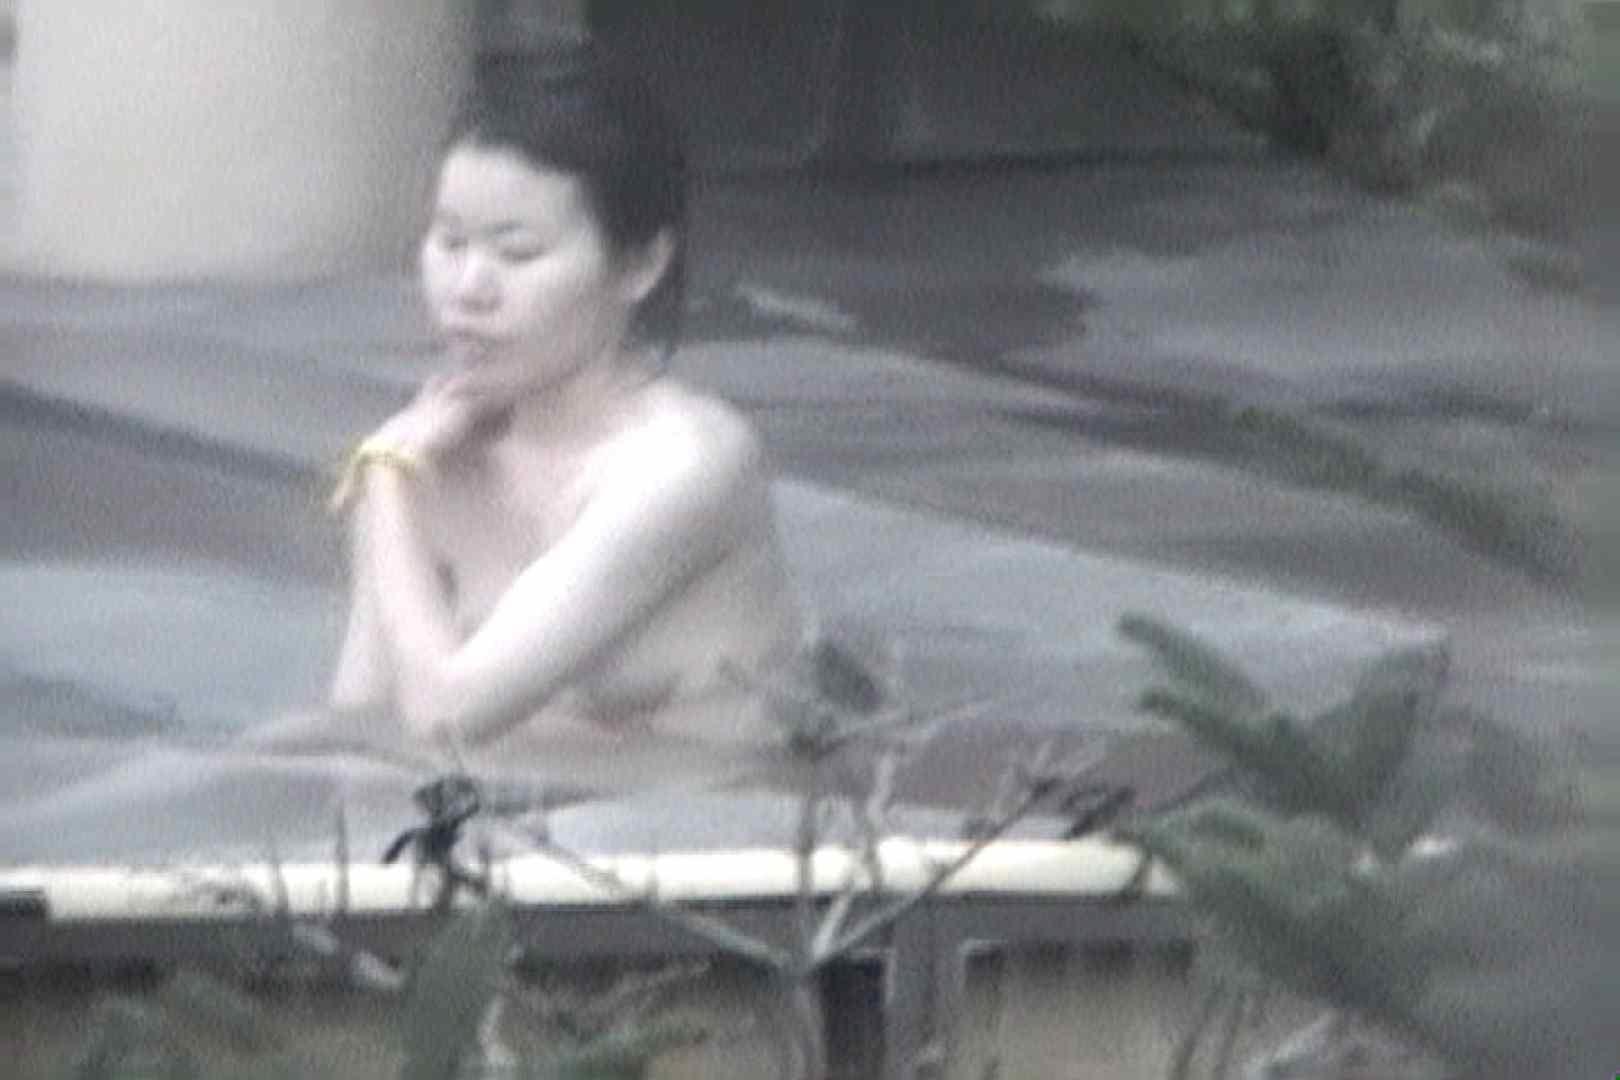 Aquaな露天風呂Vol.556 露天風呂編 | 盗撮シリーズ  99PIX 47